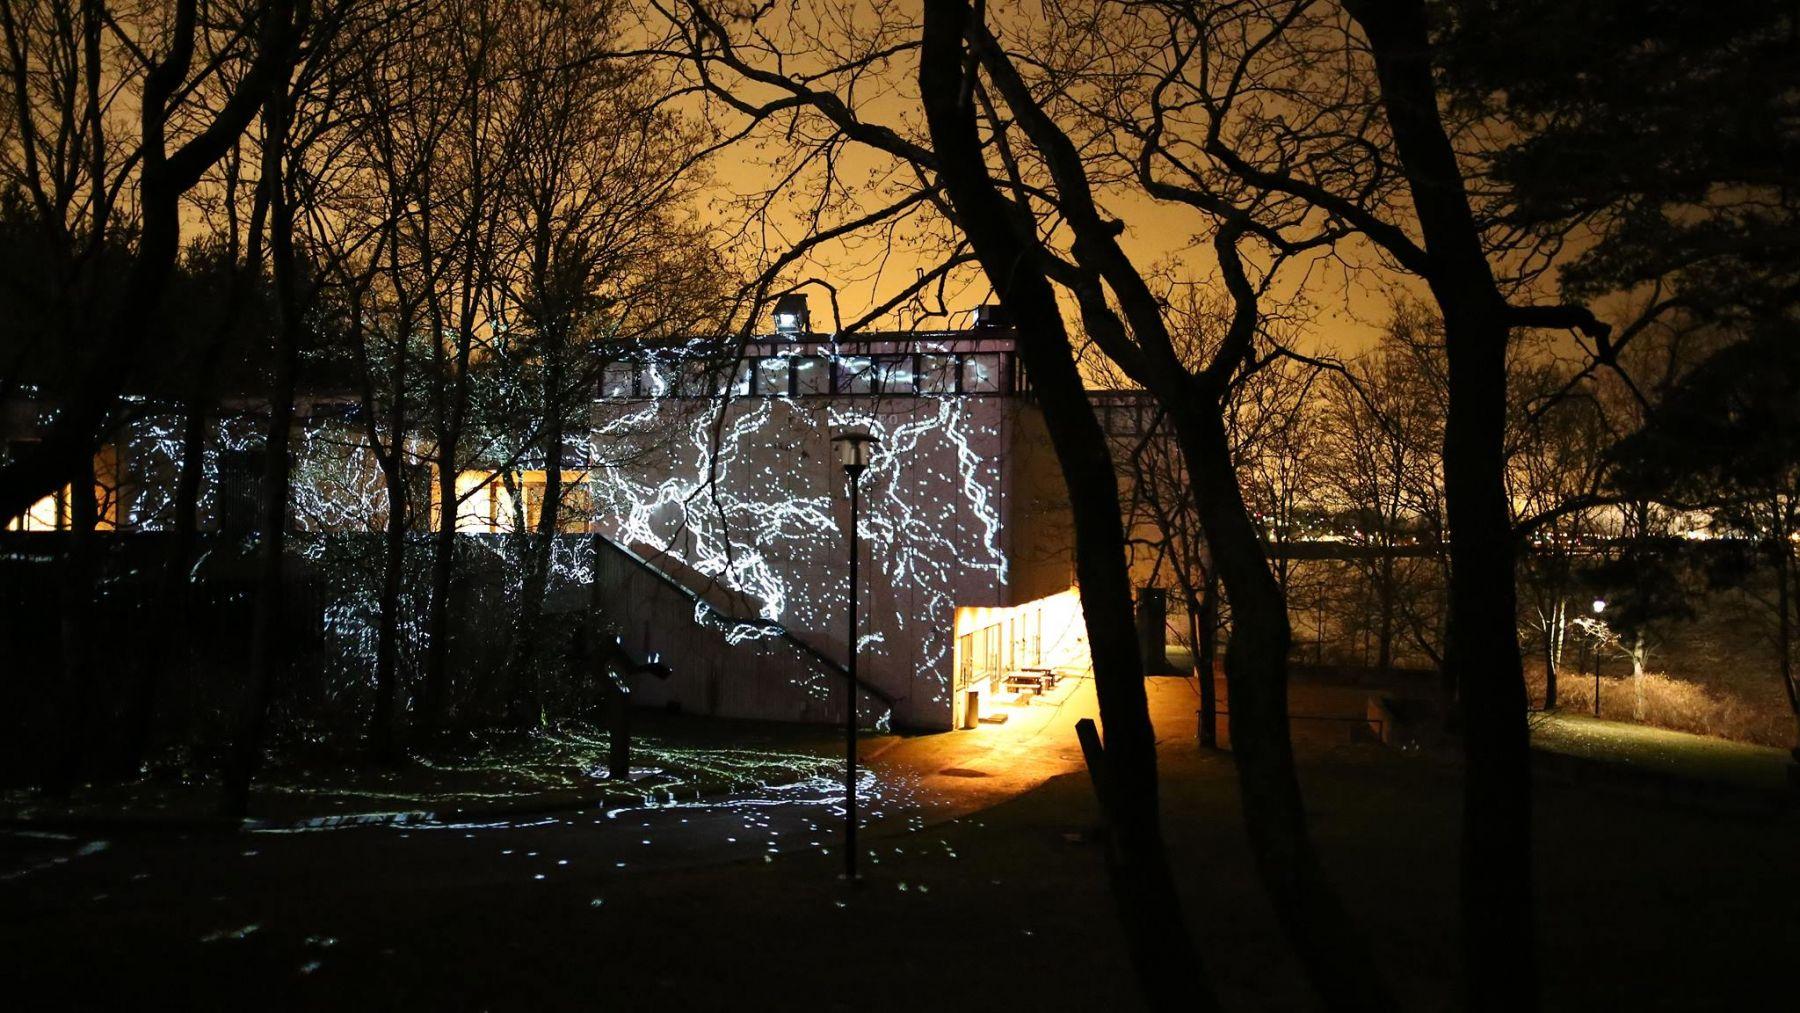 Charles Sandison's installation The Nature of Light illuminates the Sara Hildén Art Museum